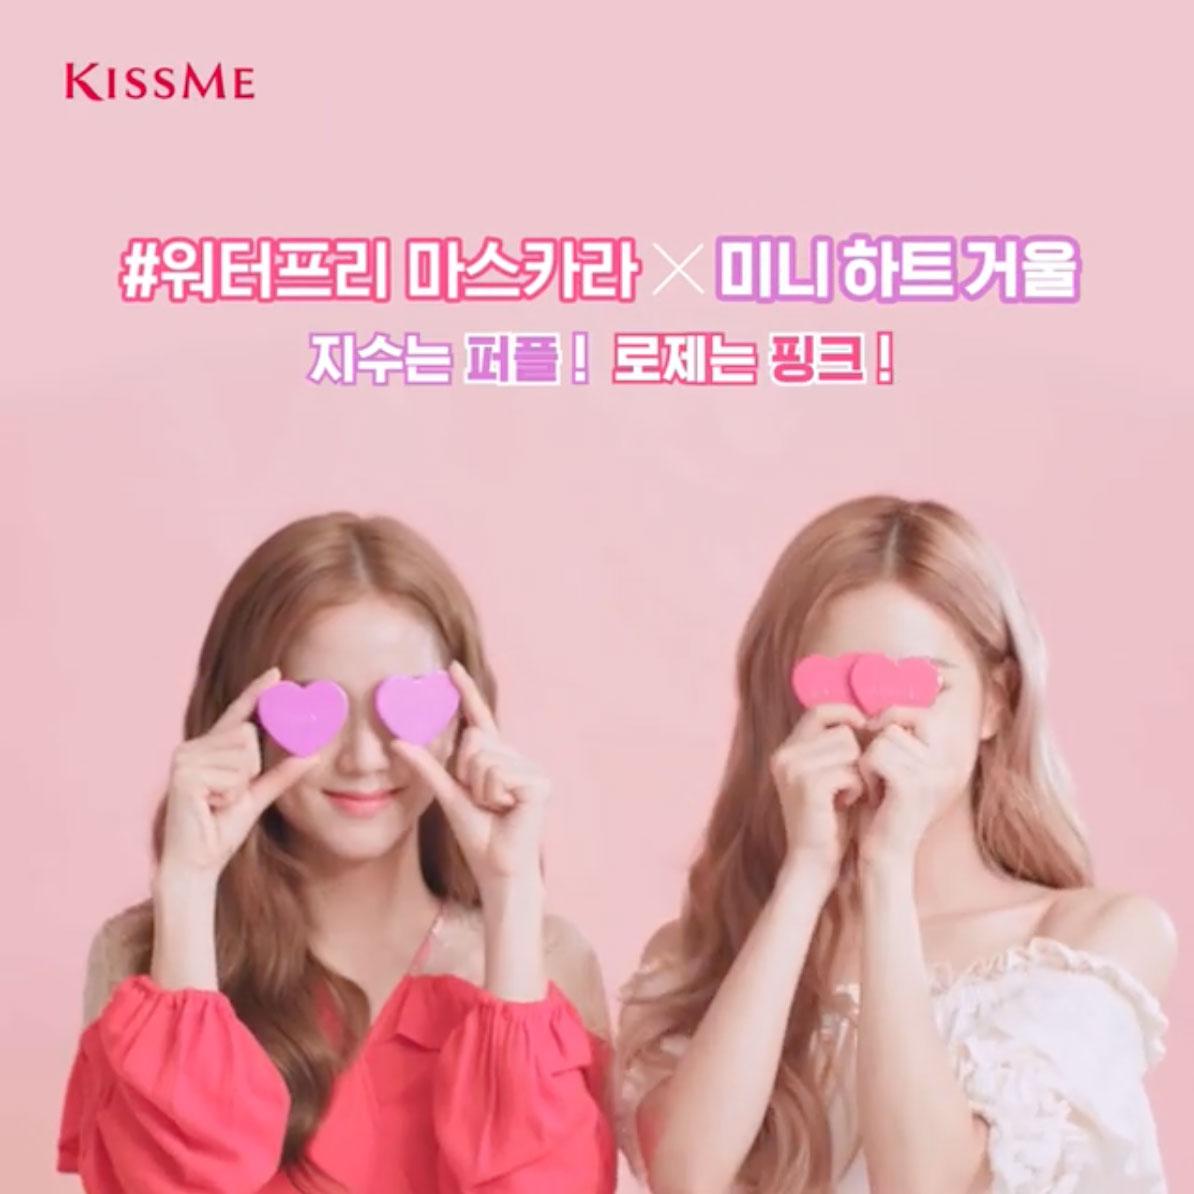 Black And Pink Kiss Makeup: 8-BLACKPINK-Jisoo-Rose-Kiss-Me-Makeup-Brand